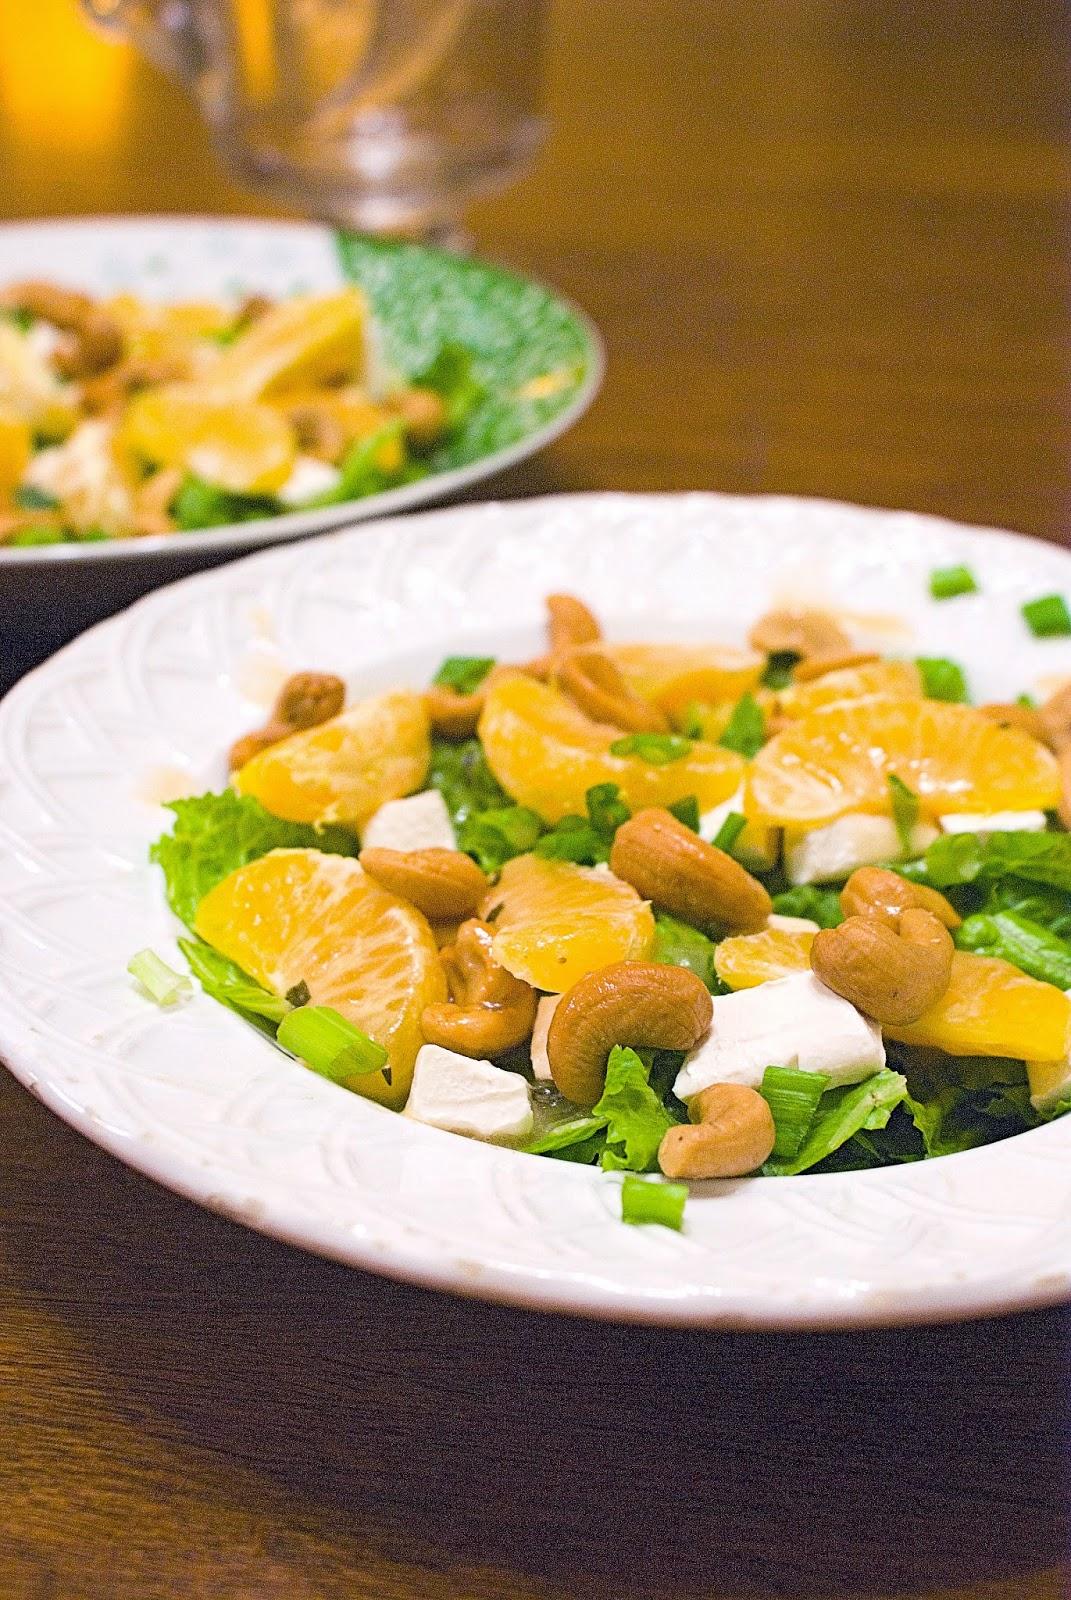 Cashew, Clementine, and Cream Cheese Salad